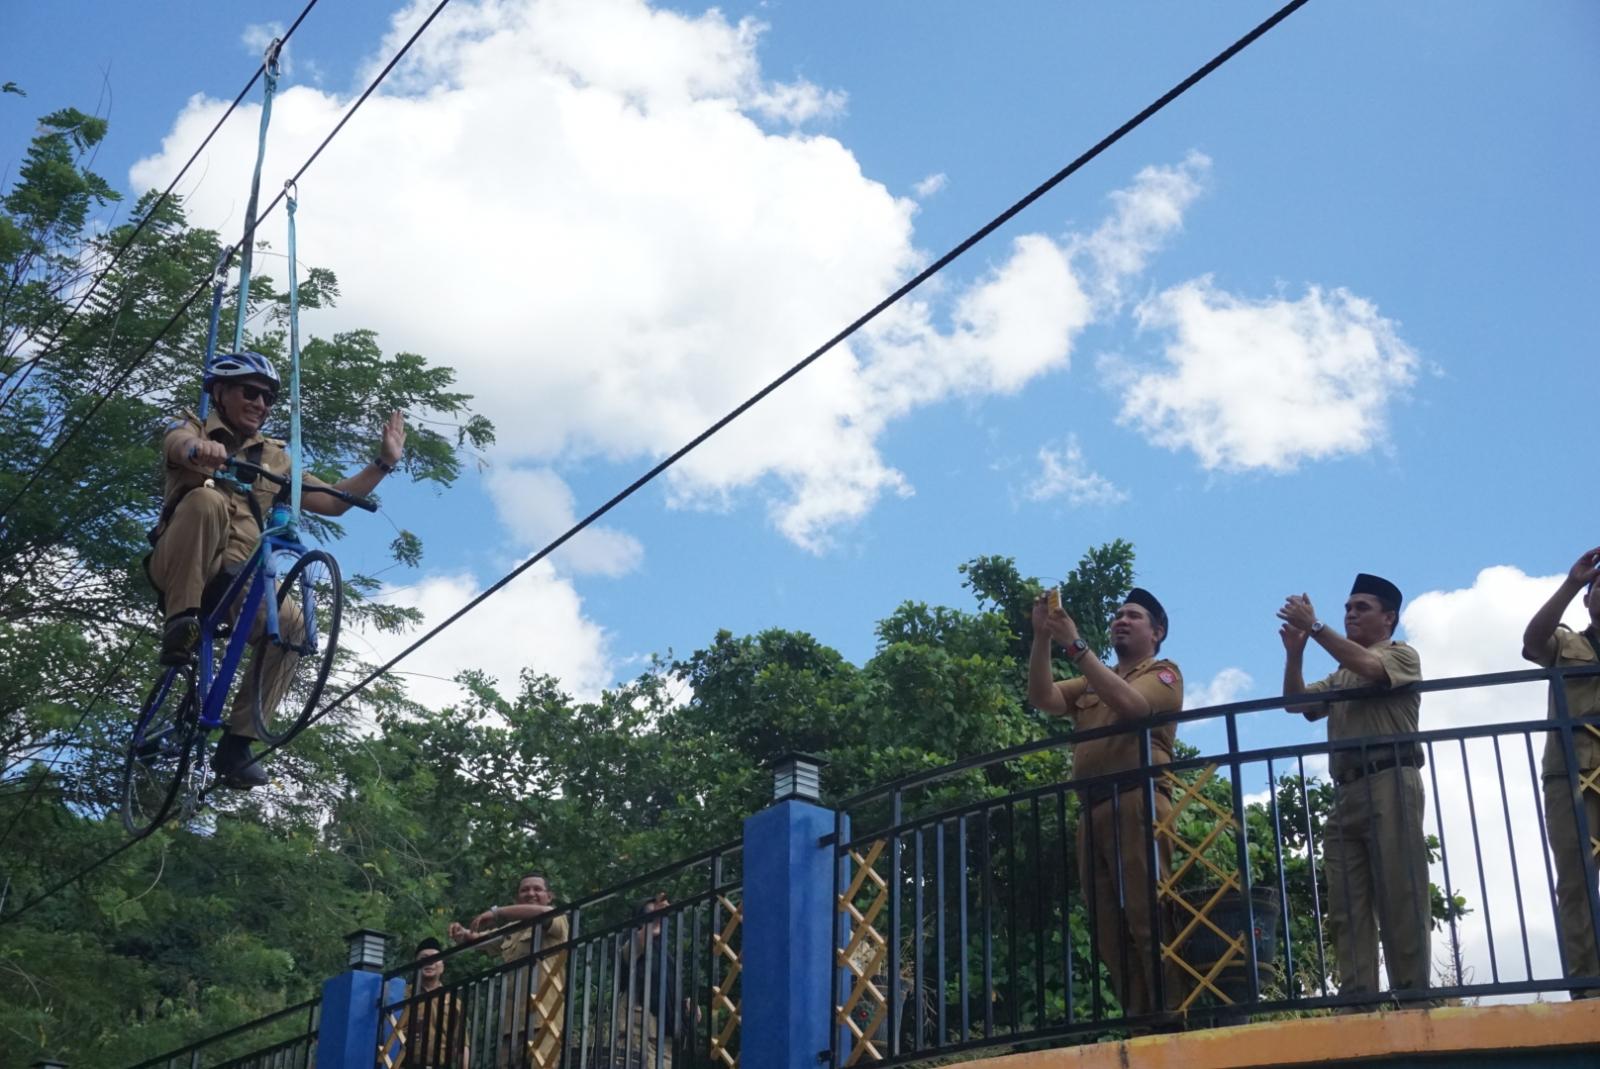 Bersepeda Udara Jadi Wahana Taman Wisata Lombongo Laut Olele Kab